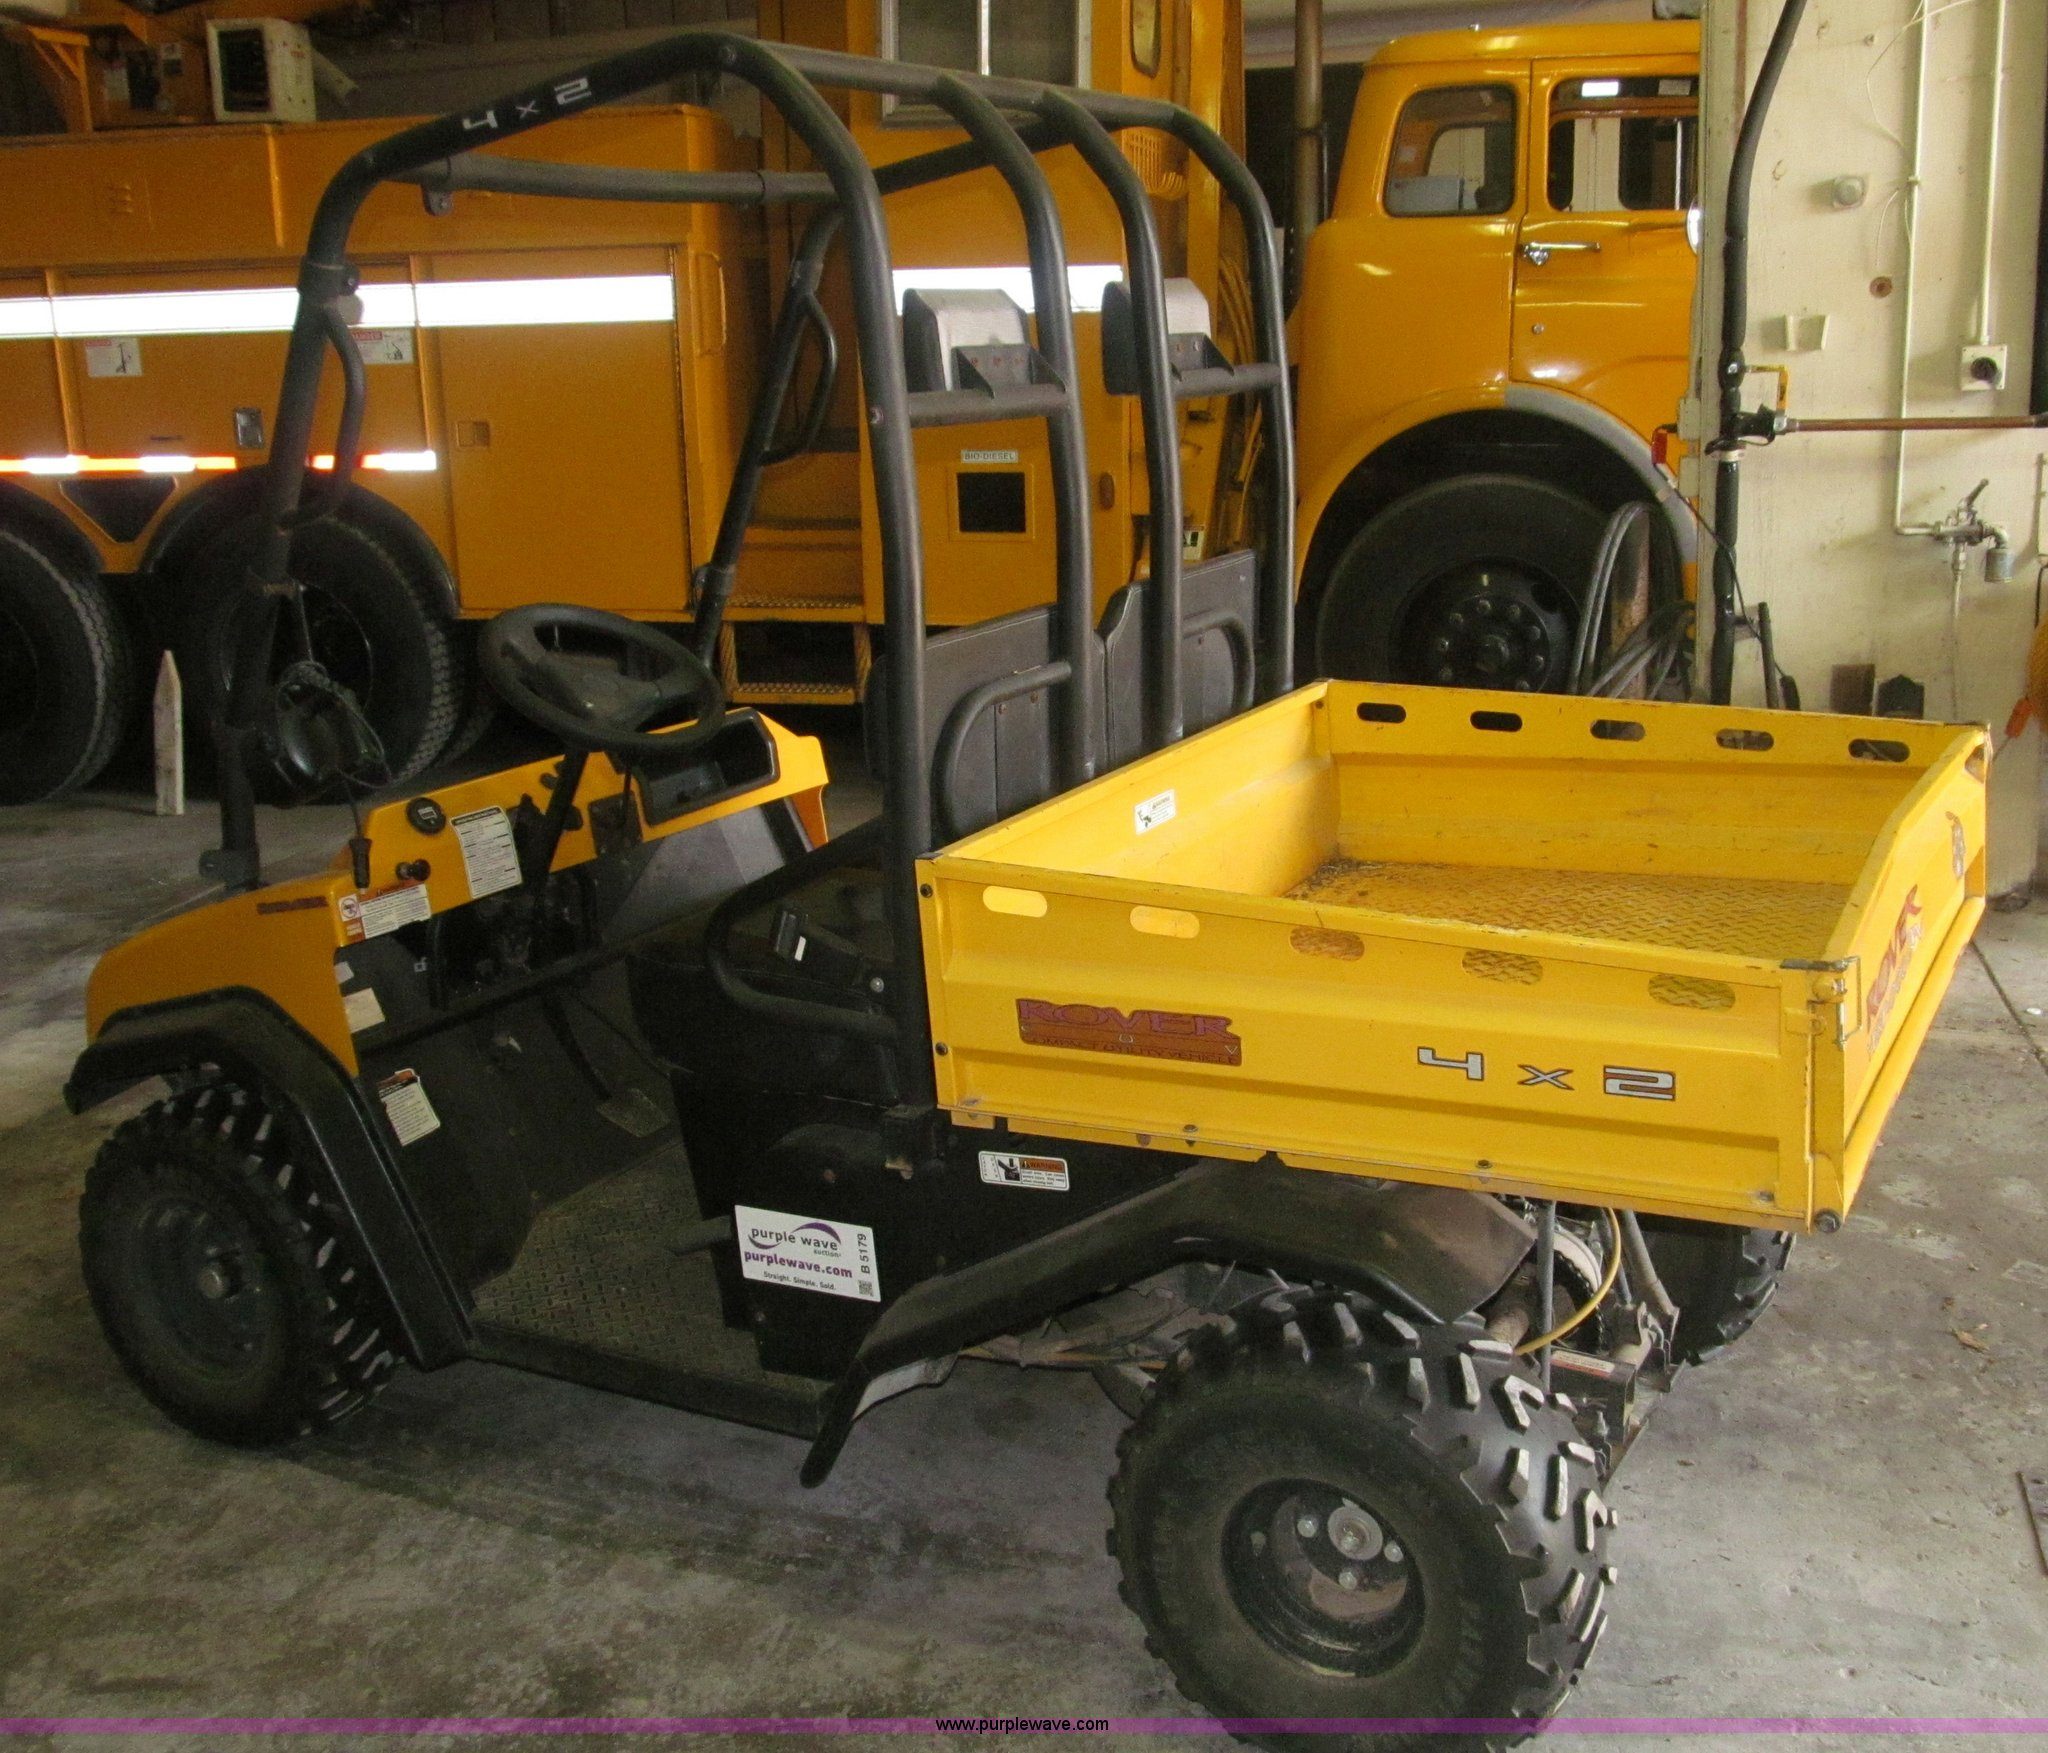 ... Yerf-dog Rover utility vehicle Full size in new window ...